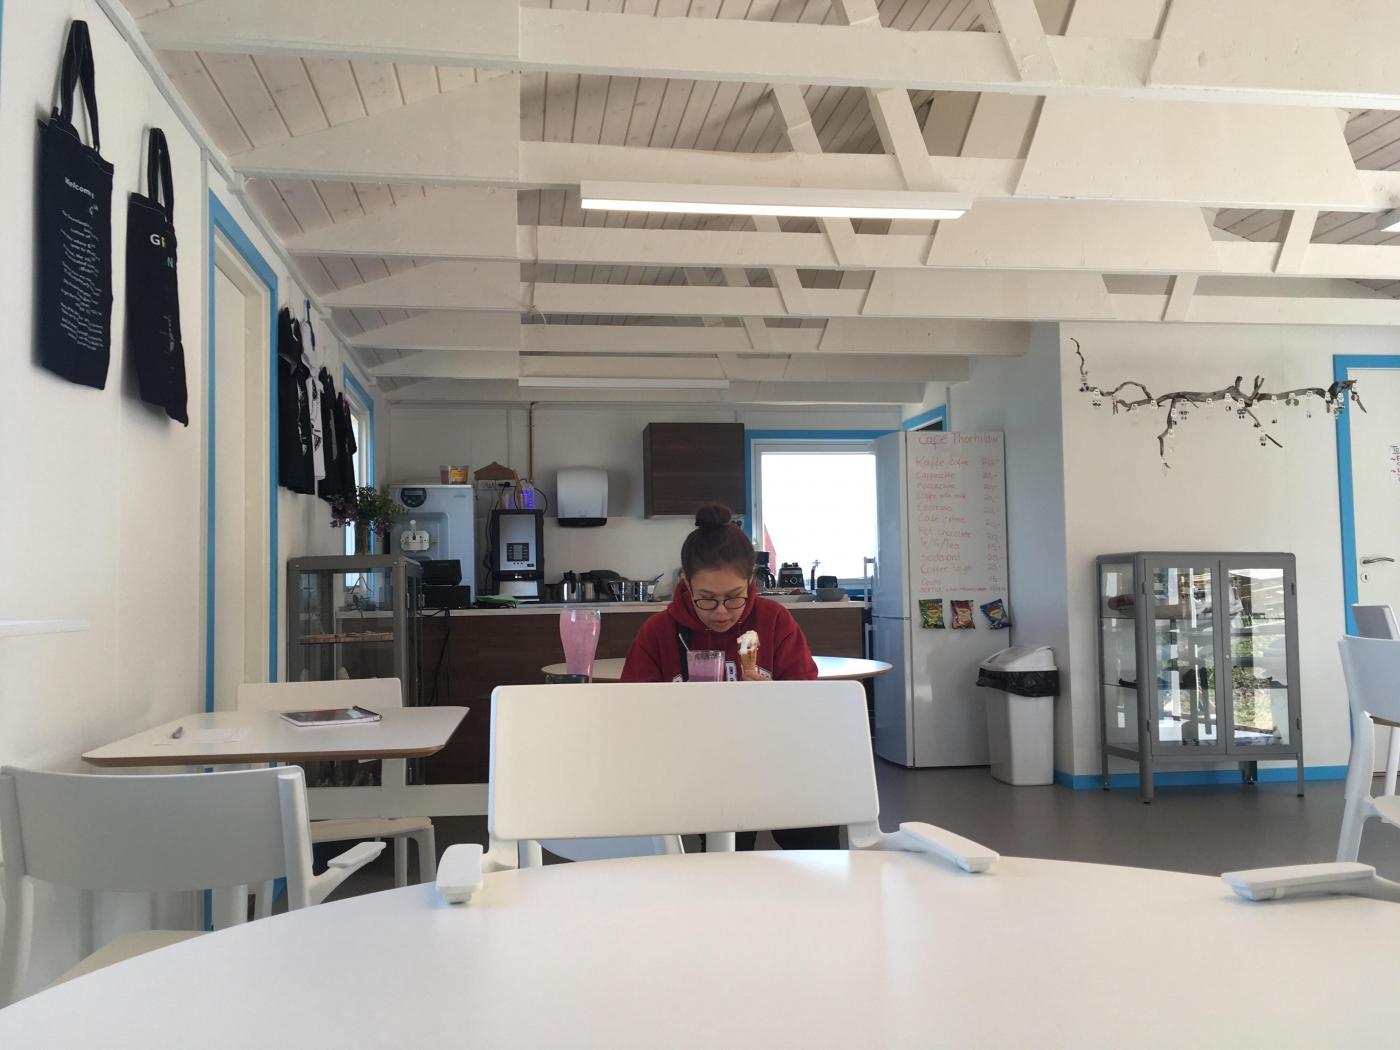 Cafe Thorhildur woman drinking smoothie while eating an ice cream. Visit Greenland